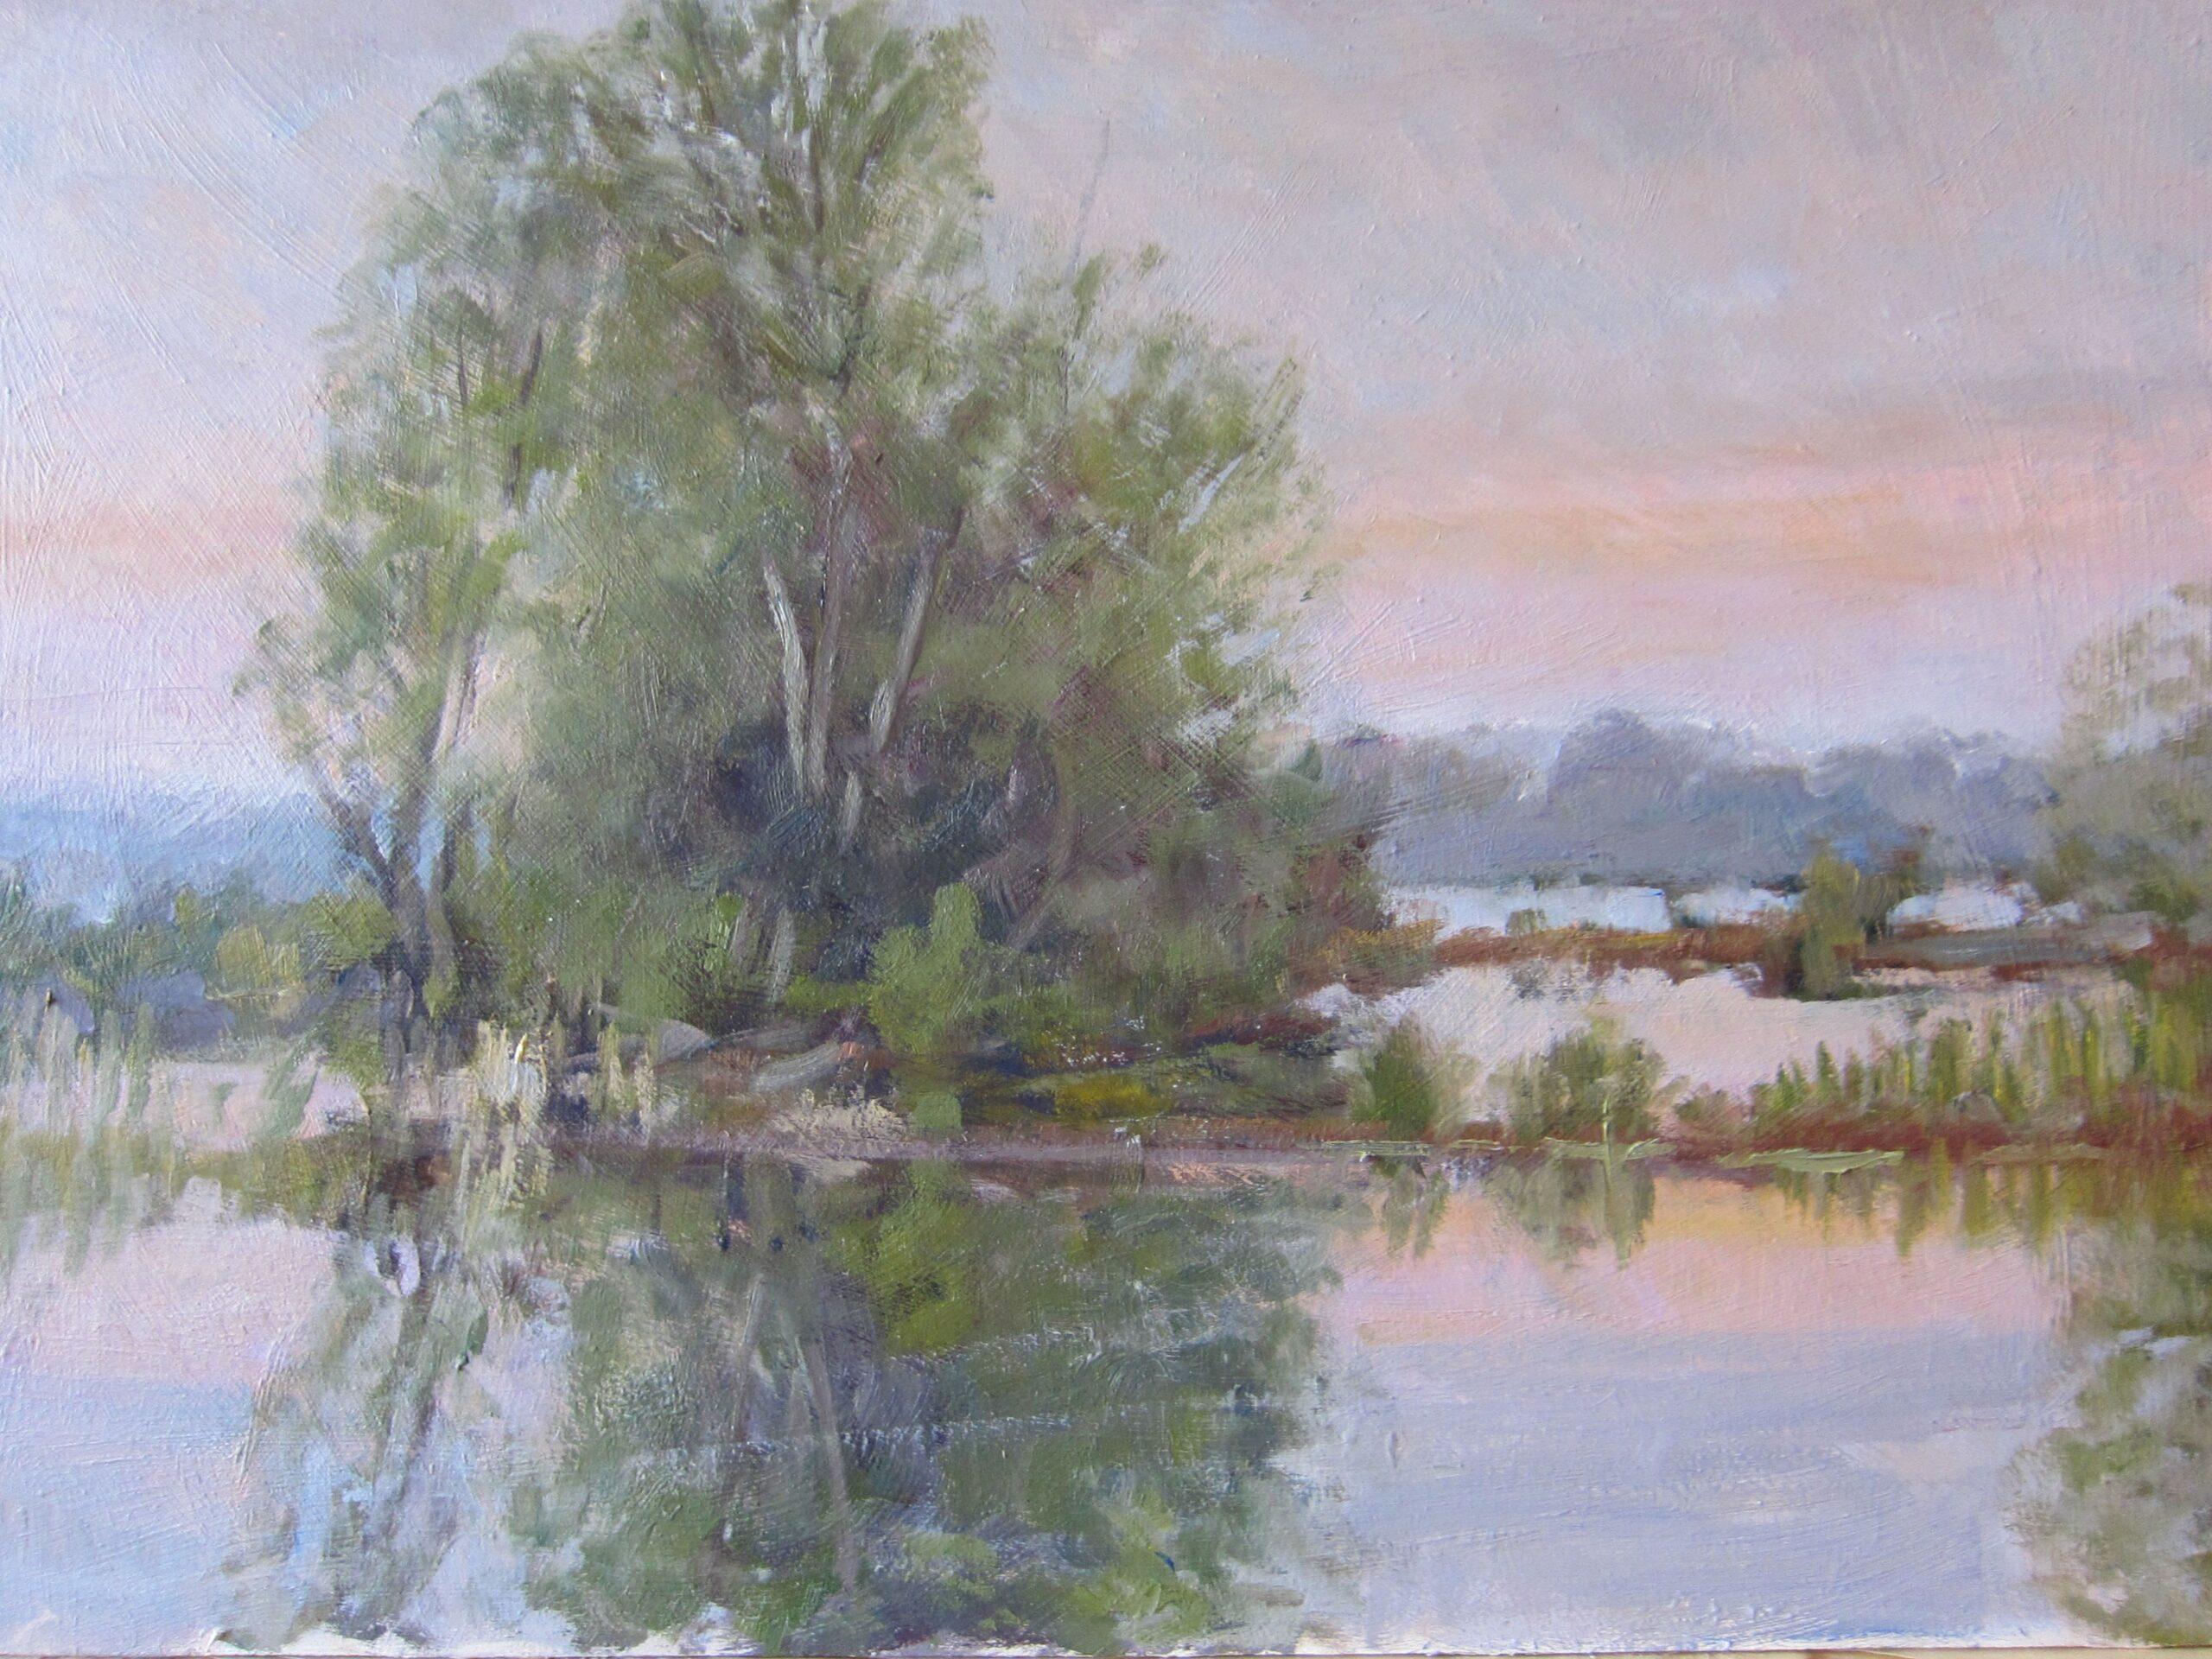 St Ives lake